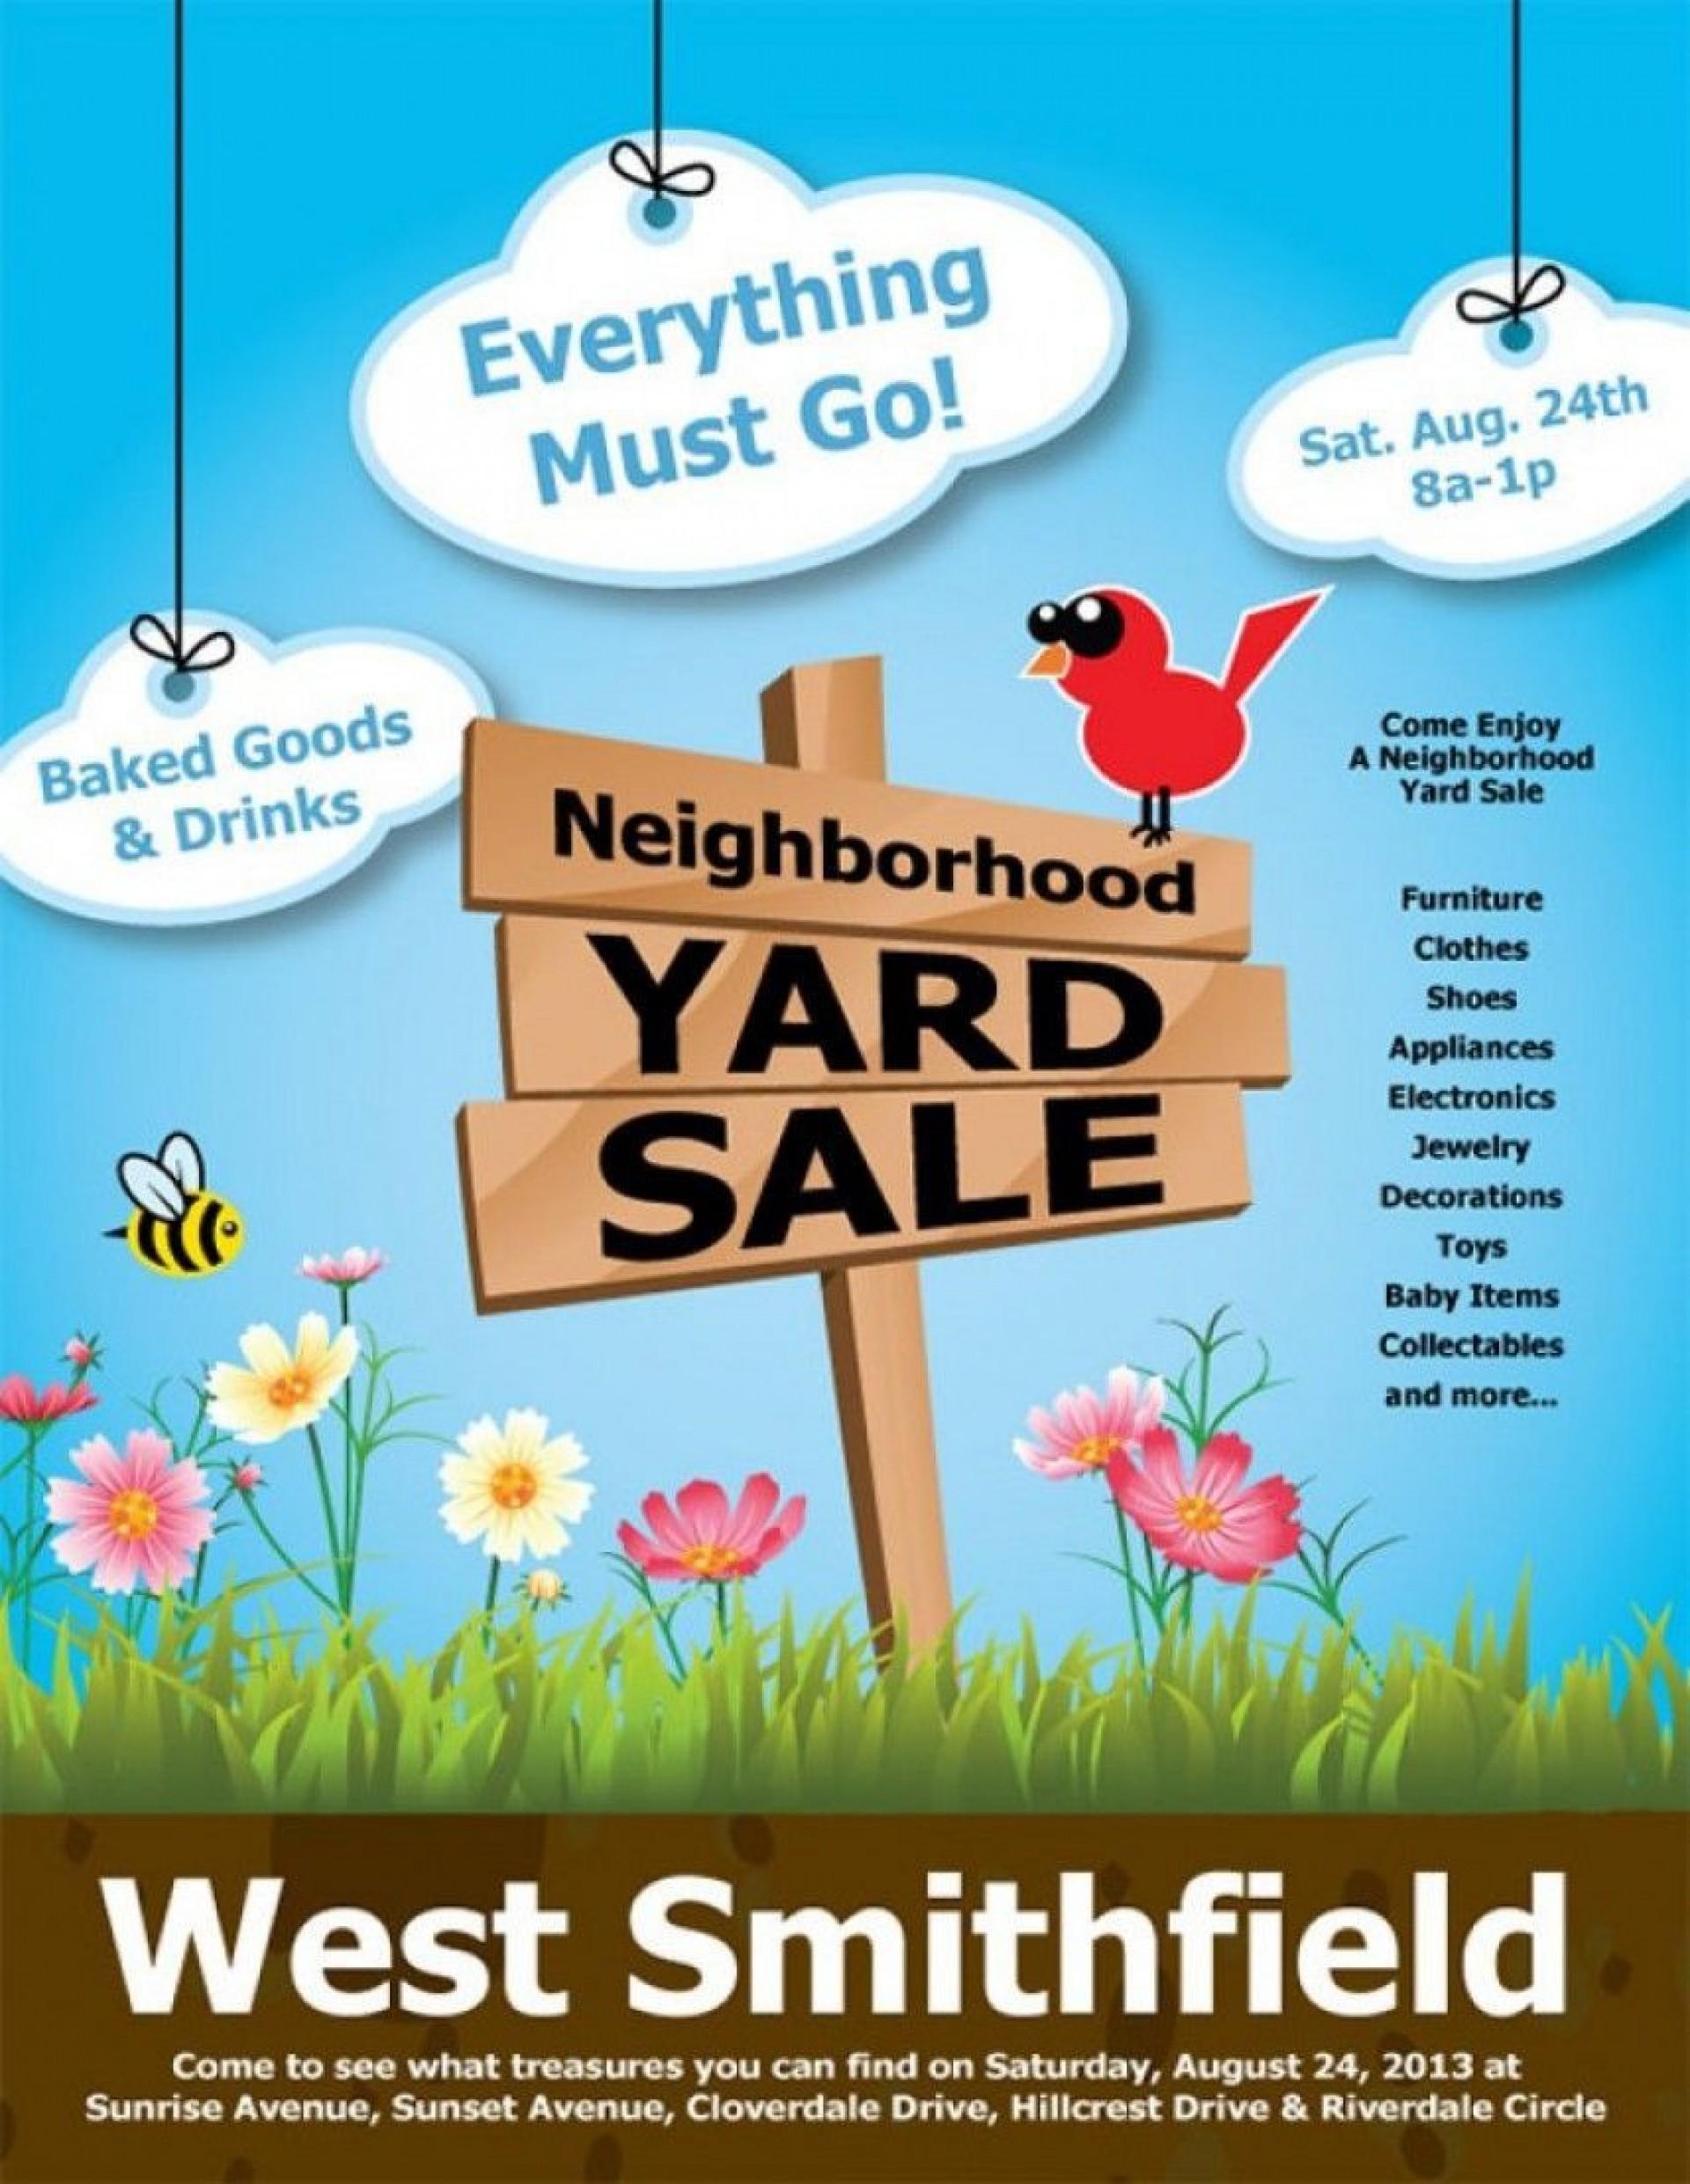 003 Phenomenal Garage Sale Flyer Template Free Design  Community Neighborhood Yard1920